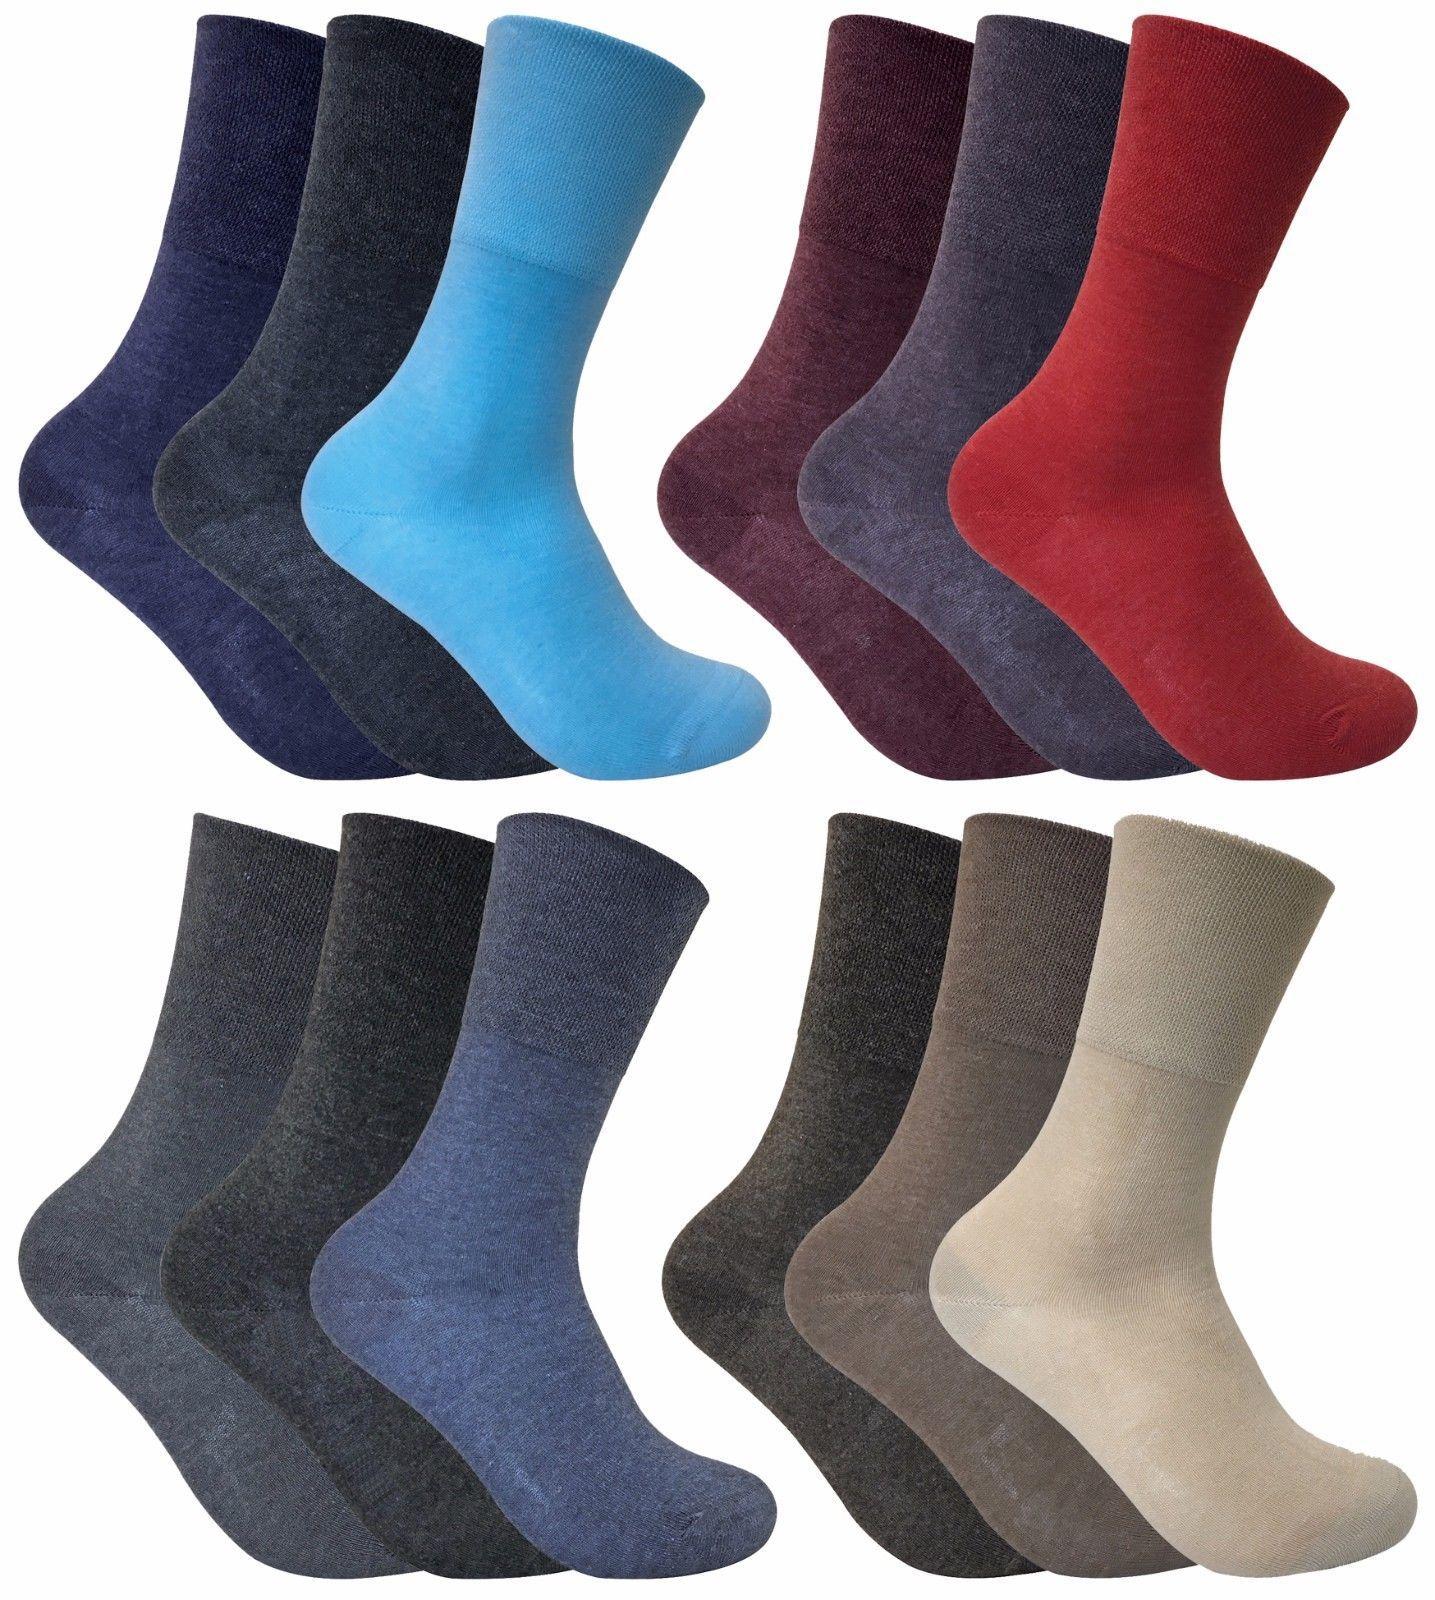 3 Pack Womens Thin Loose Wide Top Non Binding Elastic Thermal Diabetic Socks - $9.99